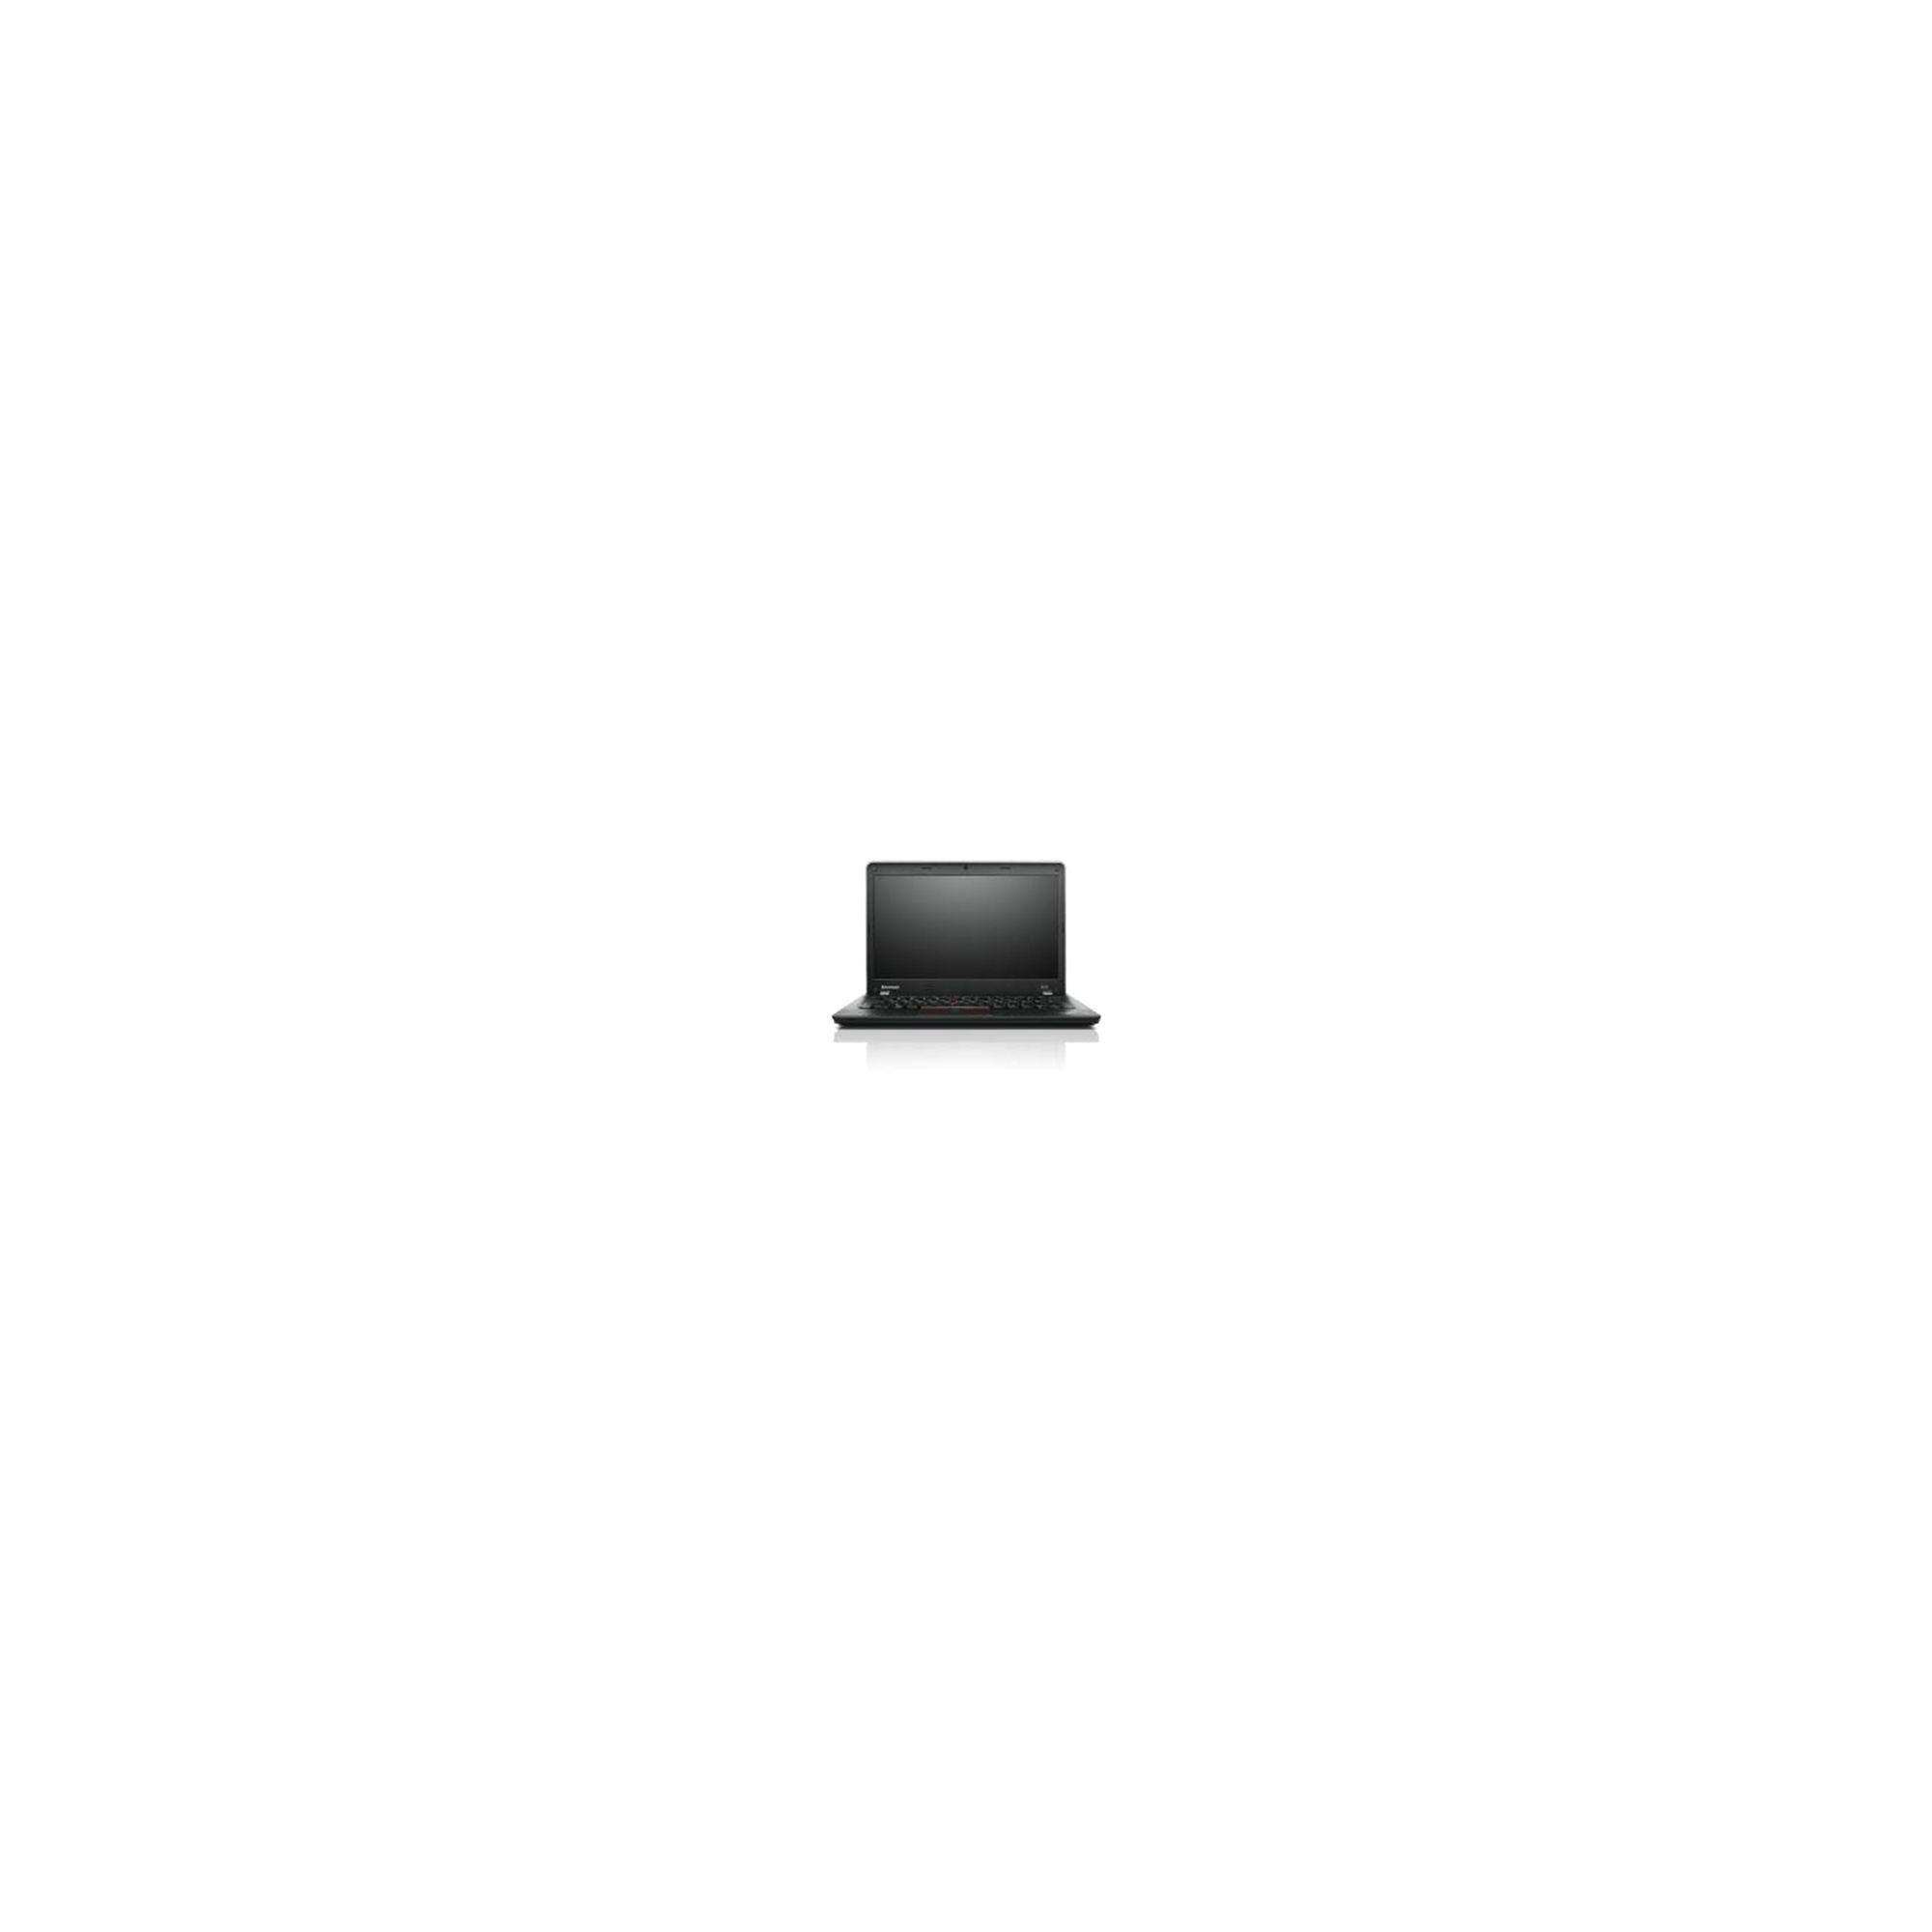 Lenovo ThinkPad Edge E330 3354AVG (13.3 inch) Notebook Core i5 (3210M) 2.5GHz 4GB 500GB WLAN BT Webcam Windows 8 Pro 64-bit (Intel HD Graphics) Black at Tesco Direct